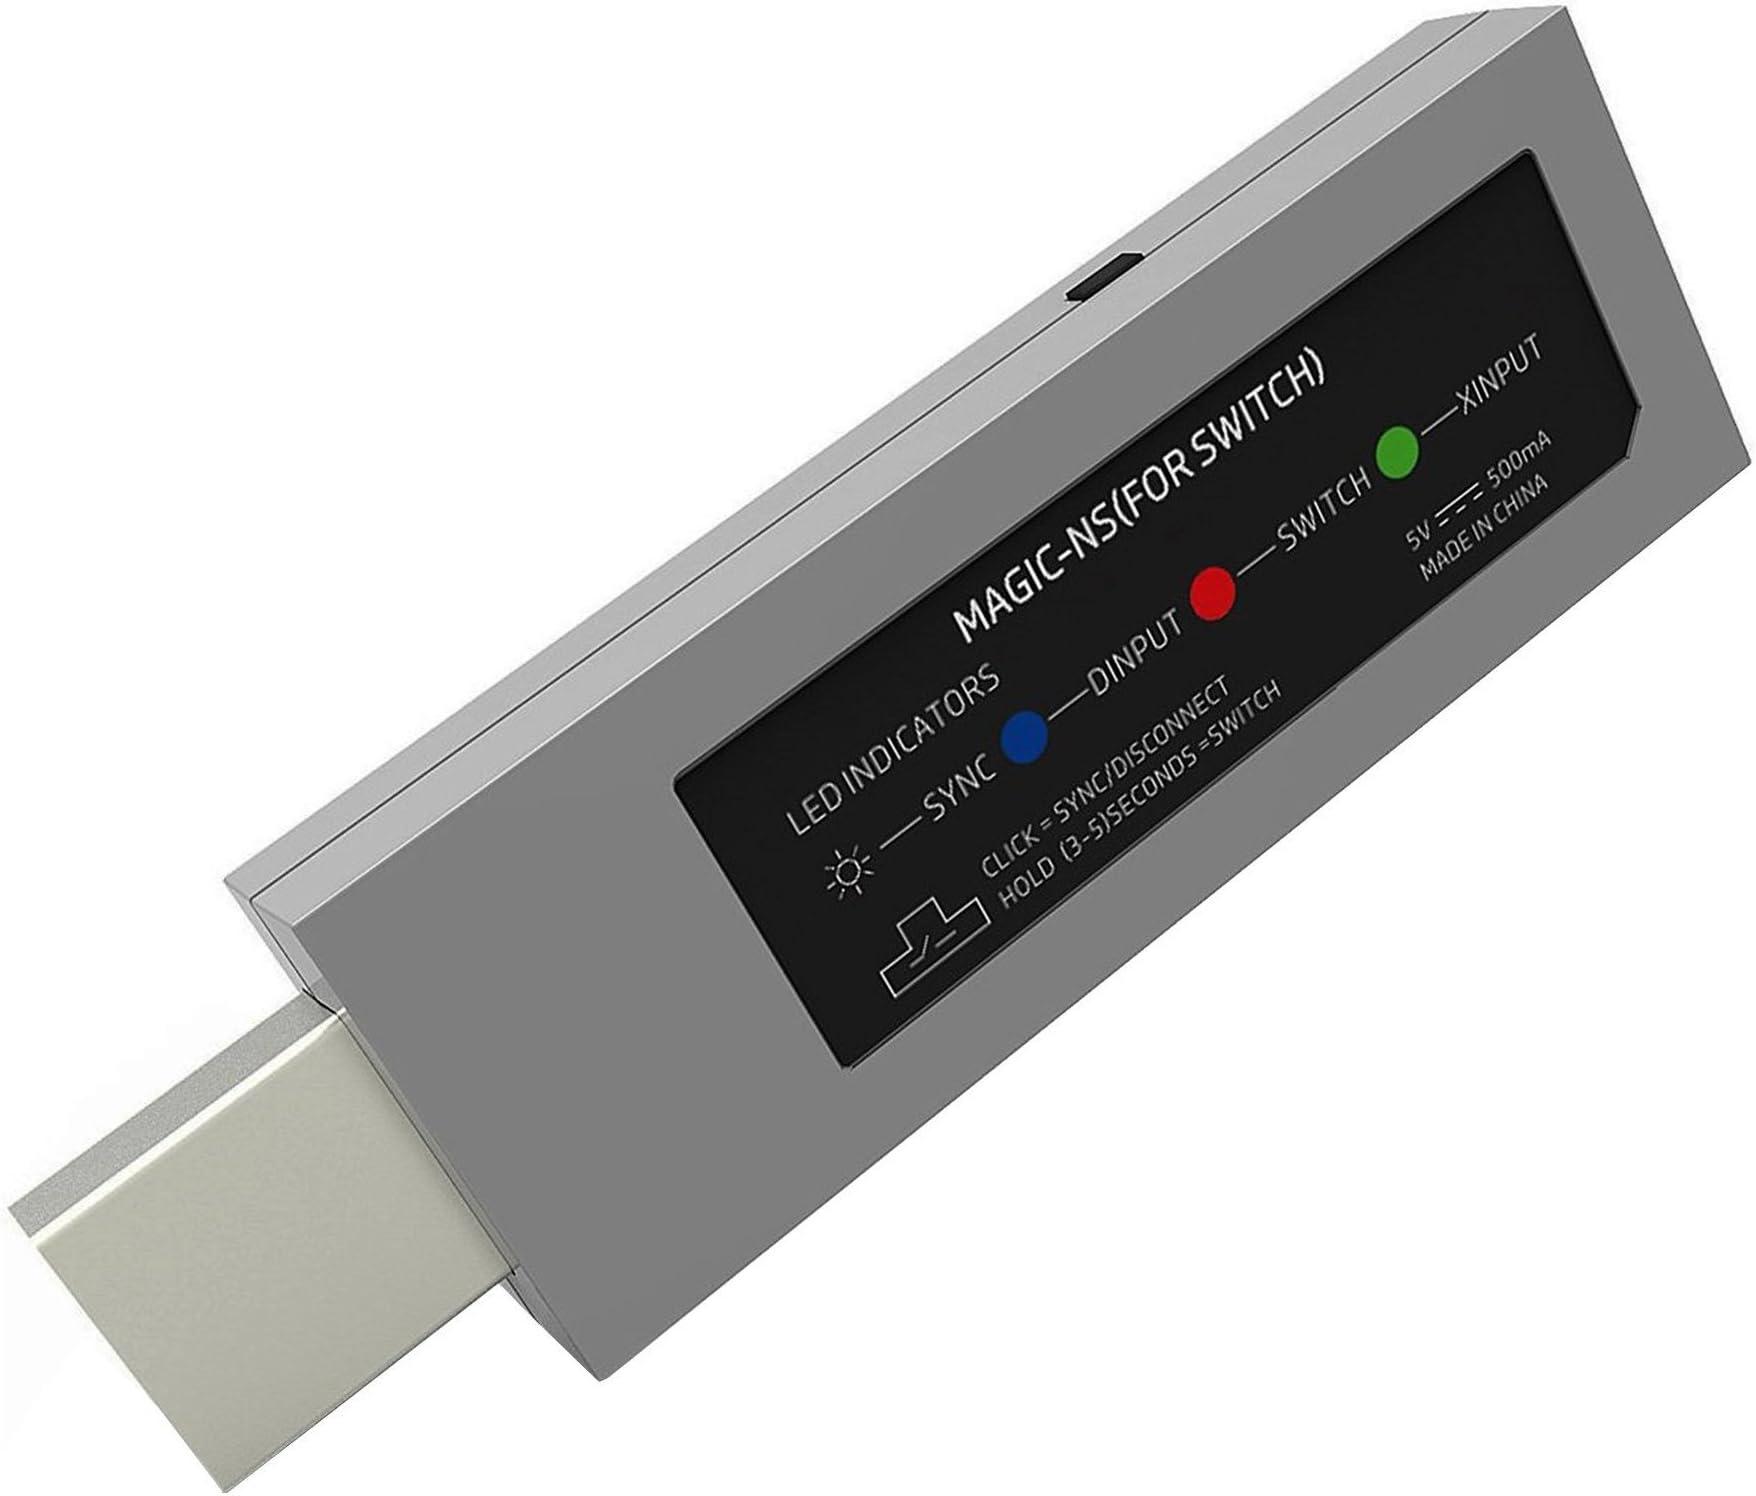 Amazon.com: Magic-NS Wireless PS3/4, Xbox360/One Controller to Nin ...